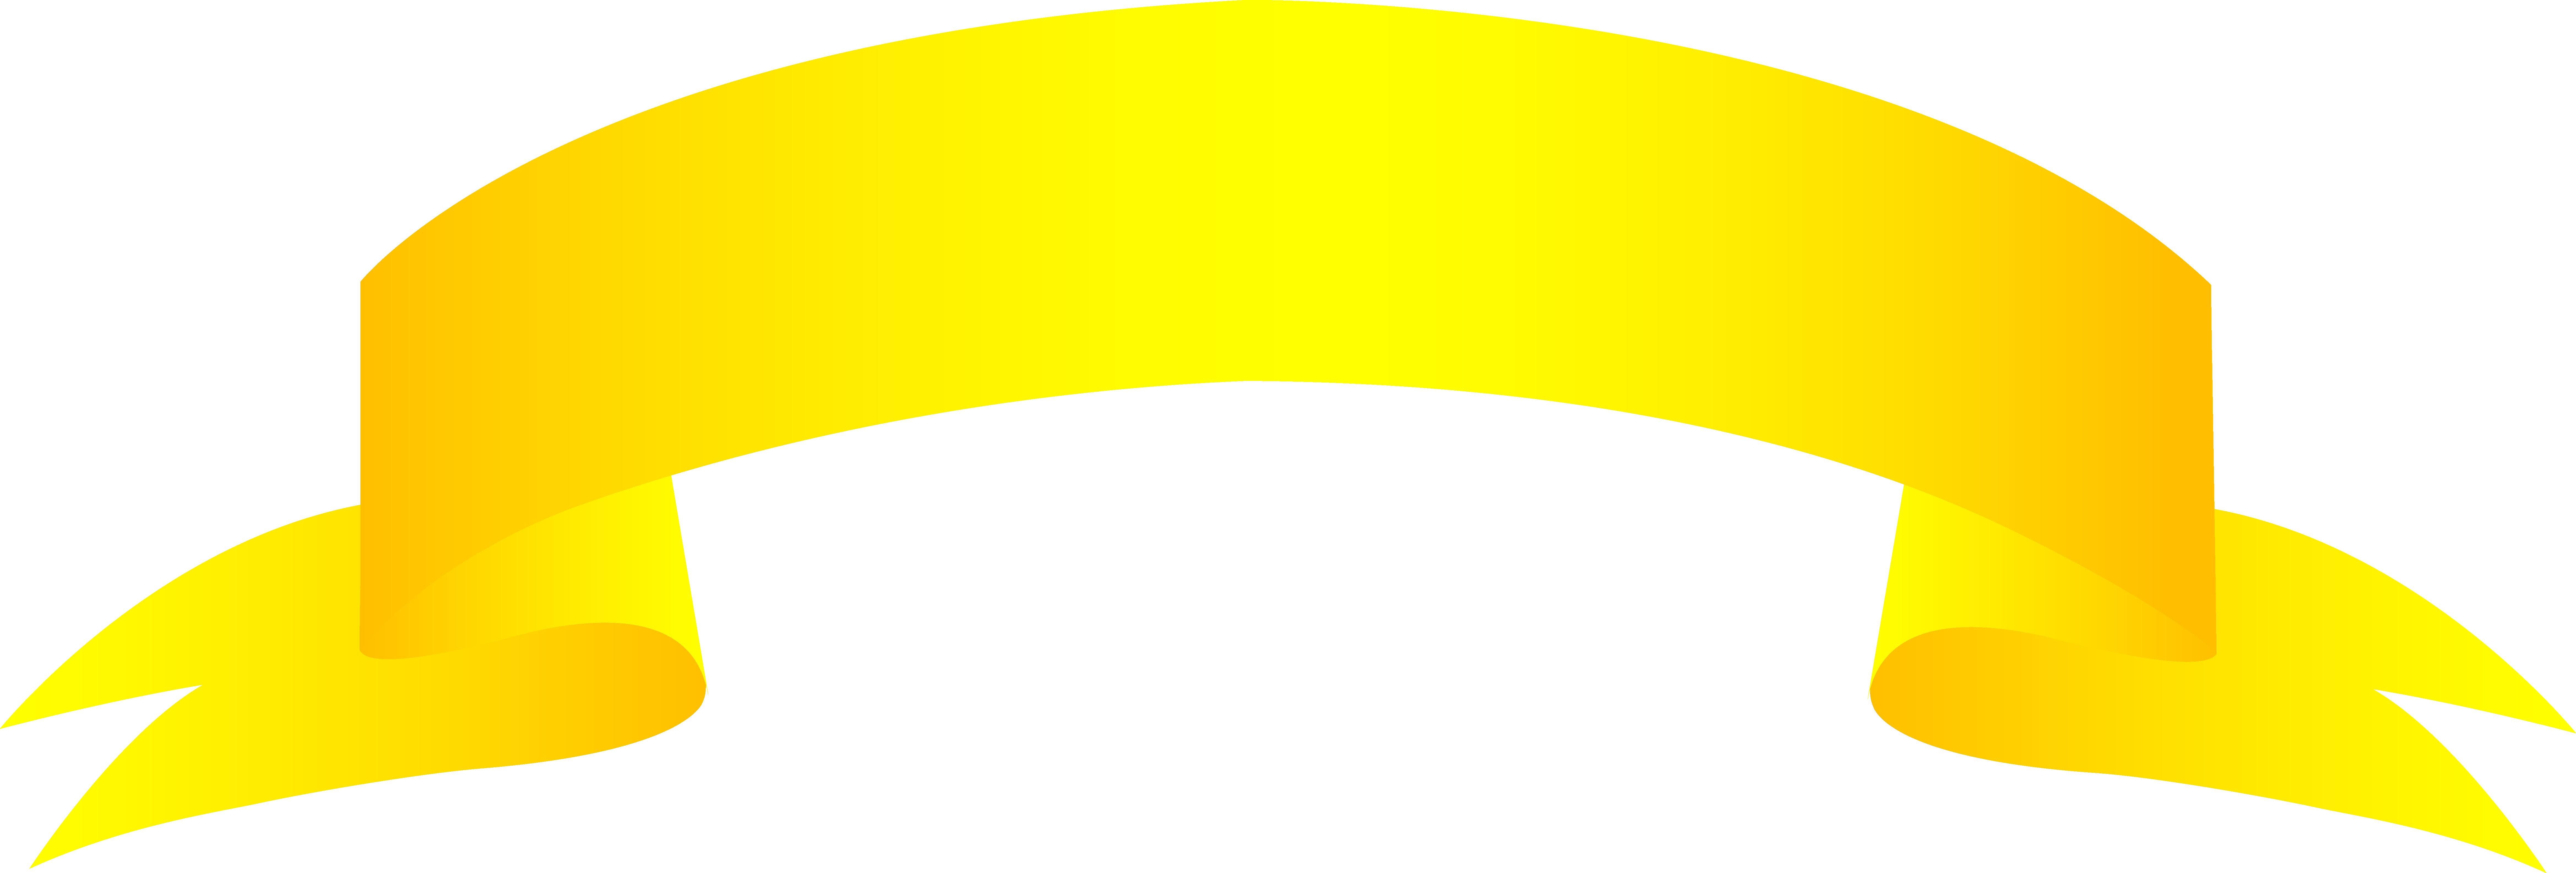 banner%20clipart